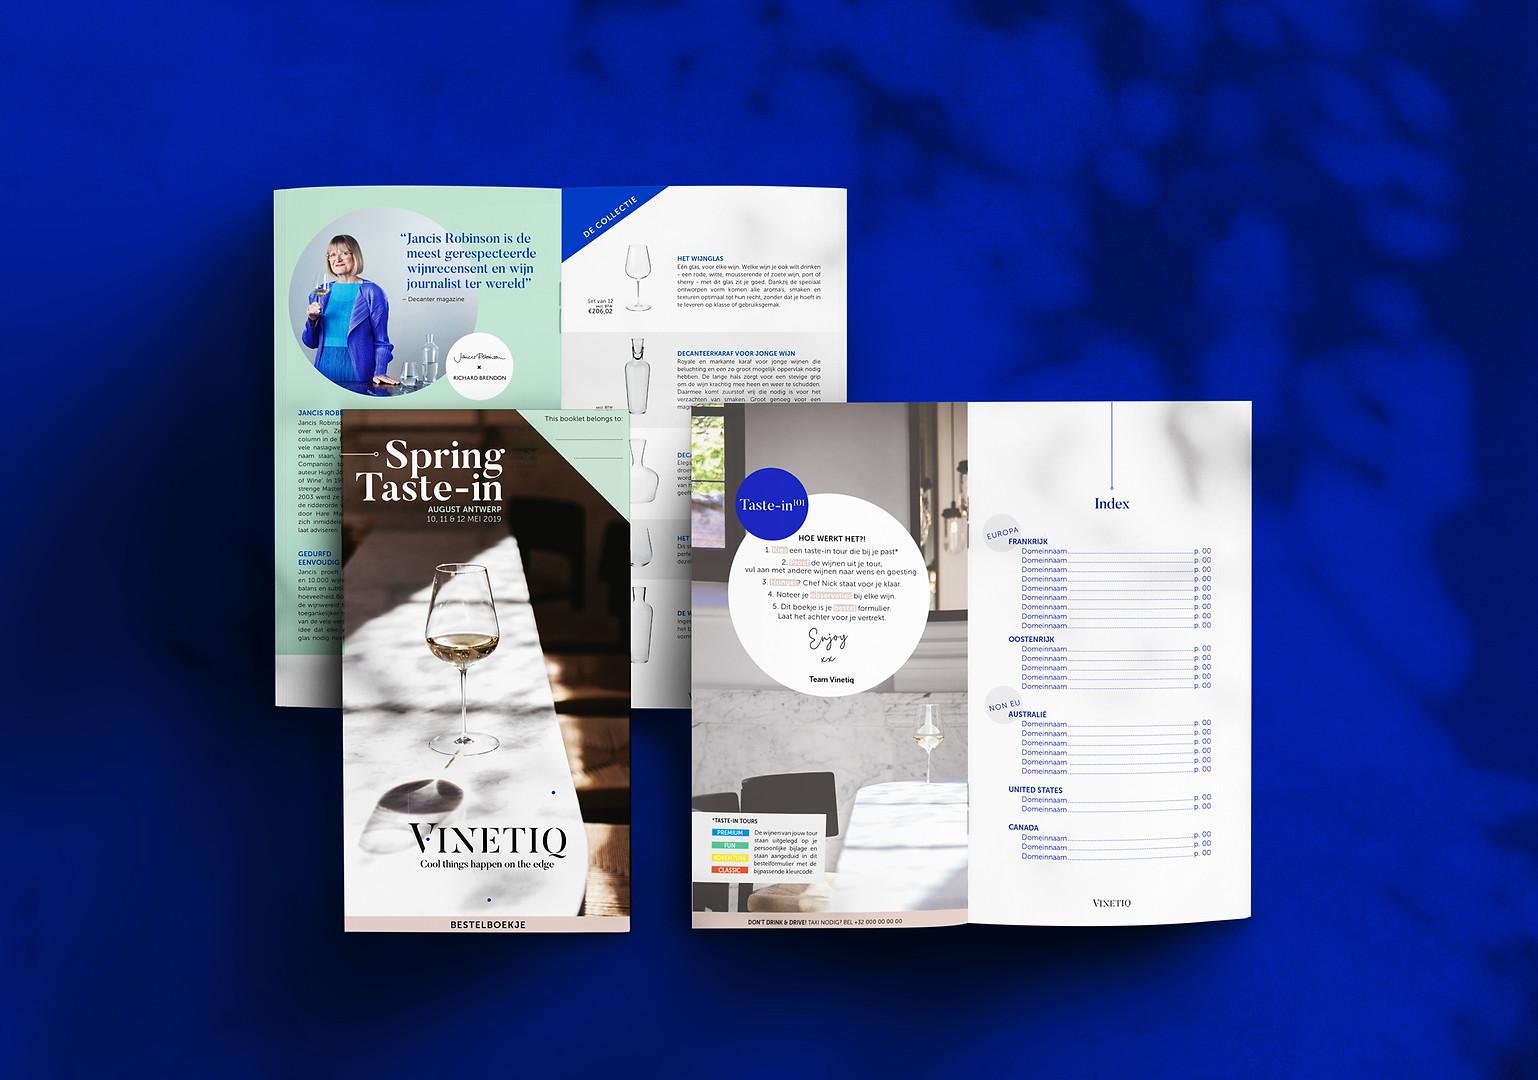 Vinetiq---Overzicht-boeken.jpg